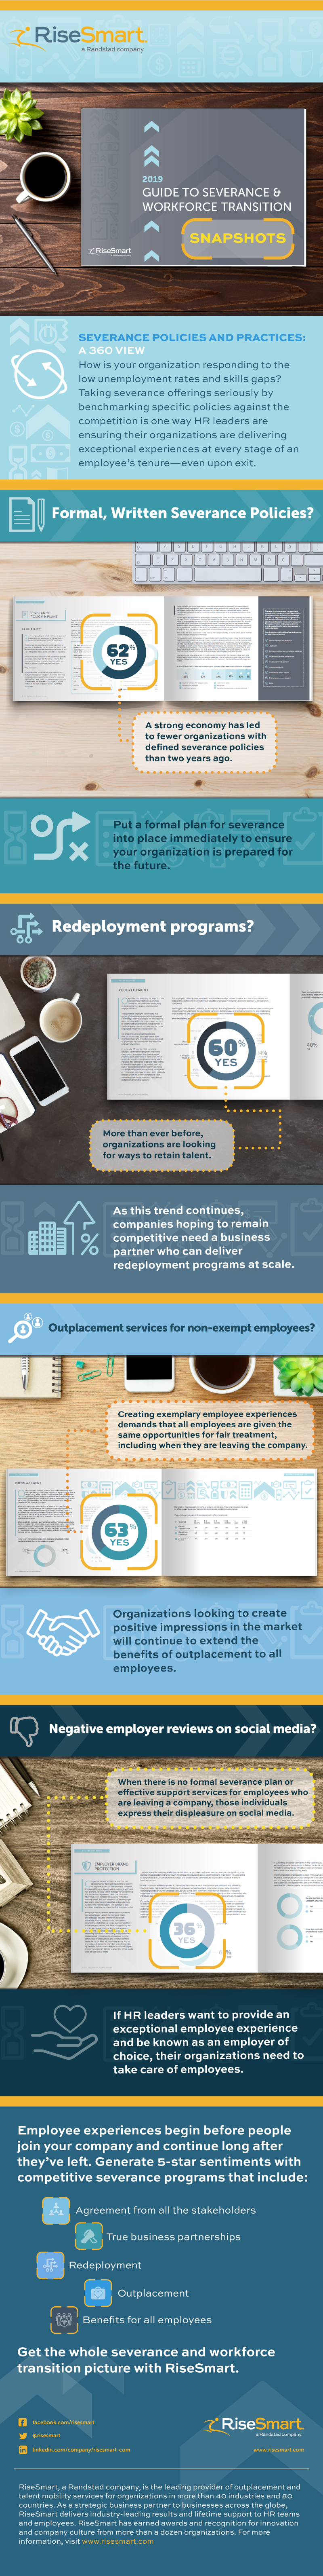 2019 Severance Study Infographic